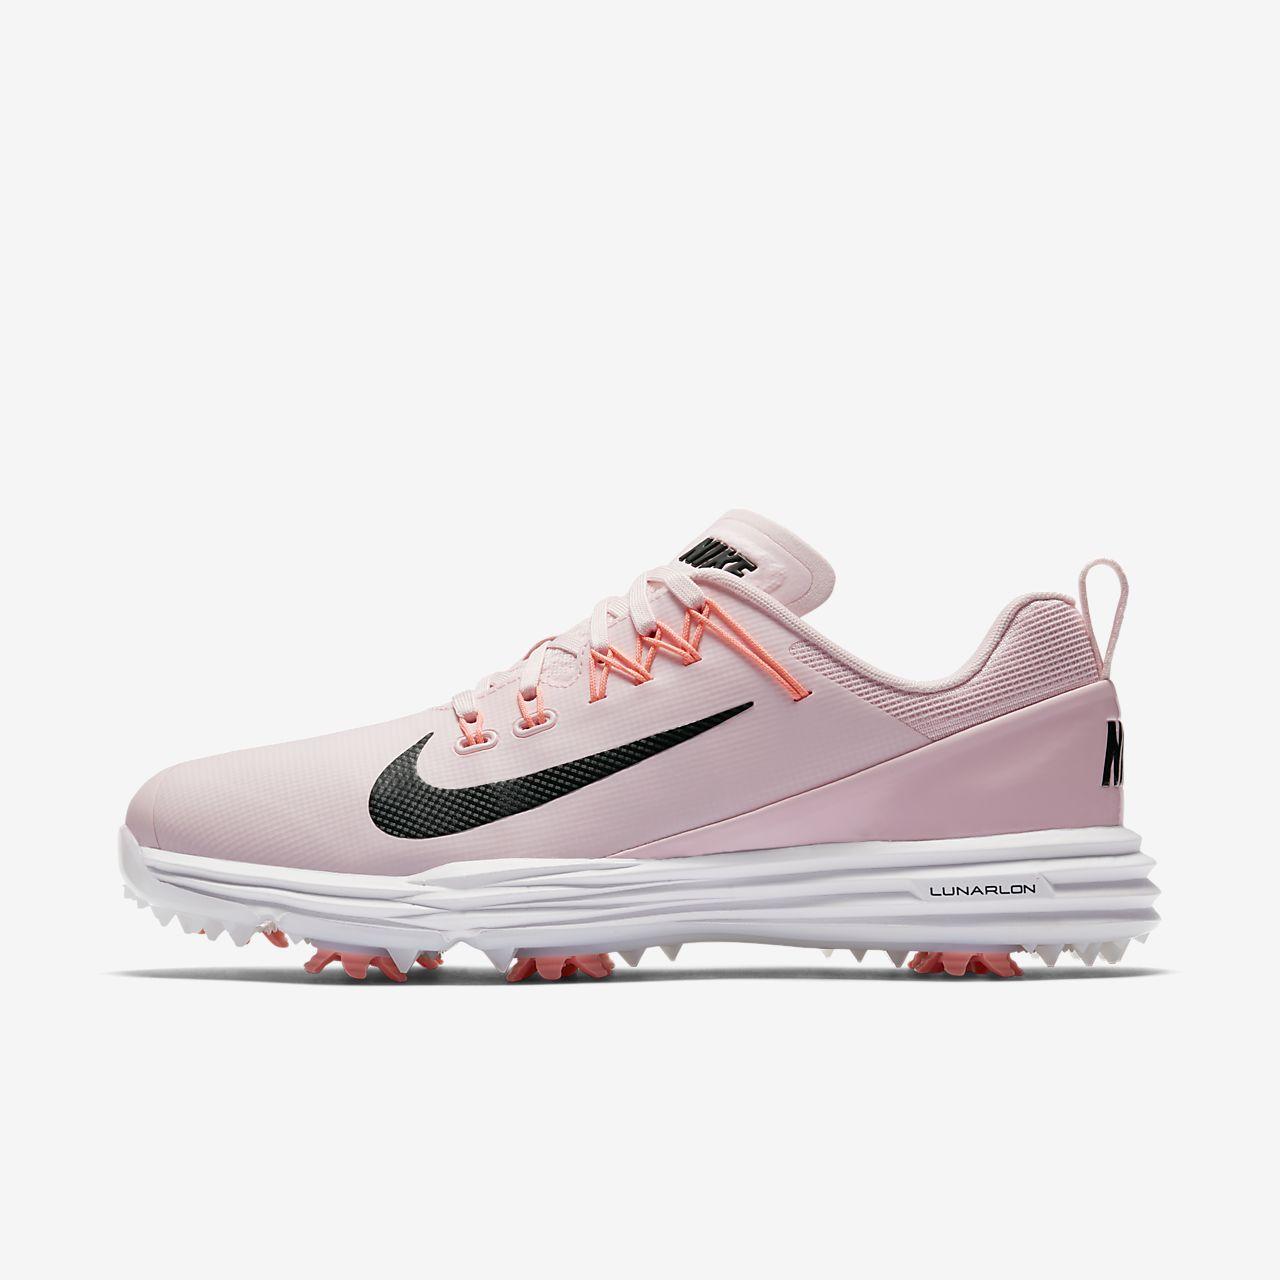 Women Shoes - Nike Lunar Classics Golf Shoes Black